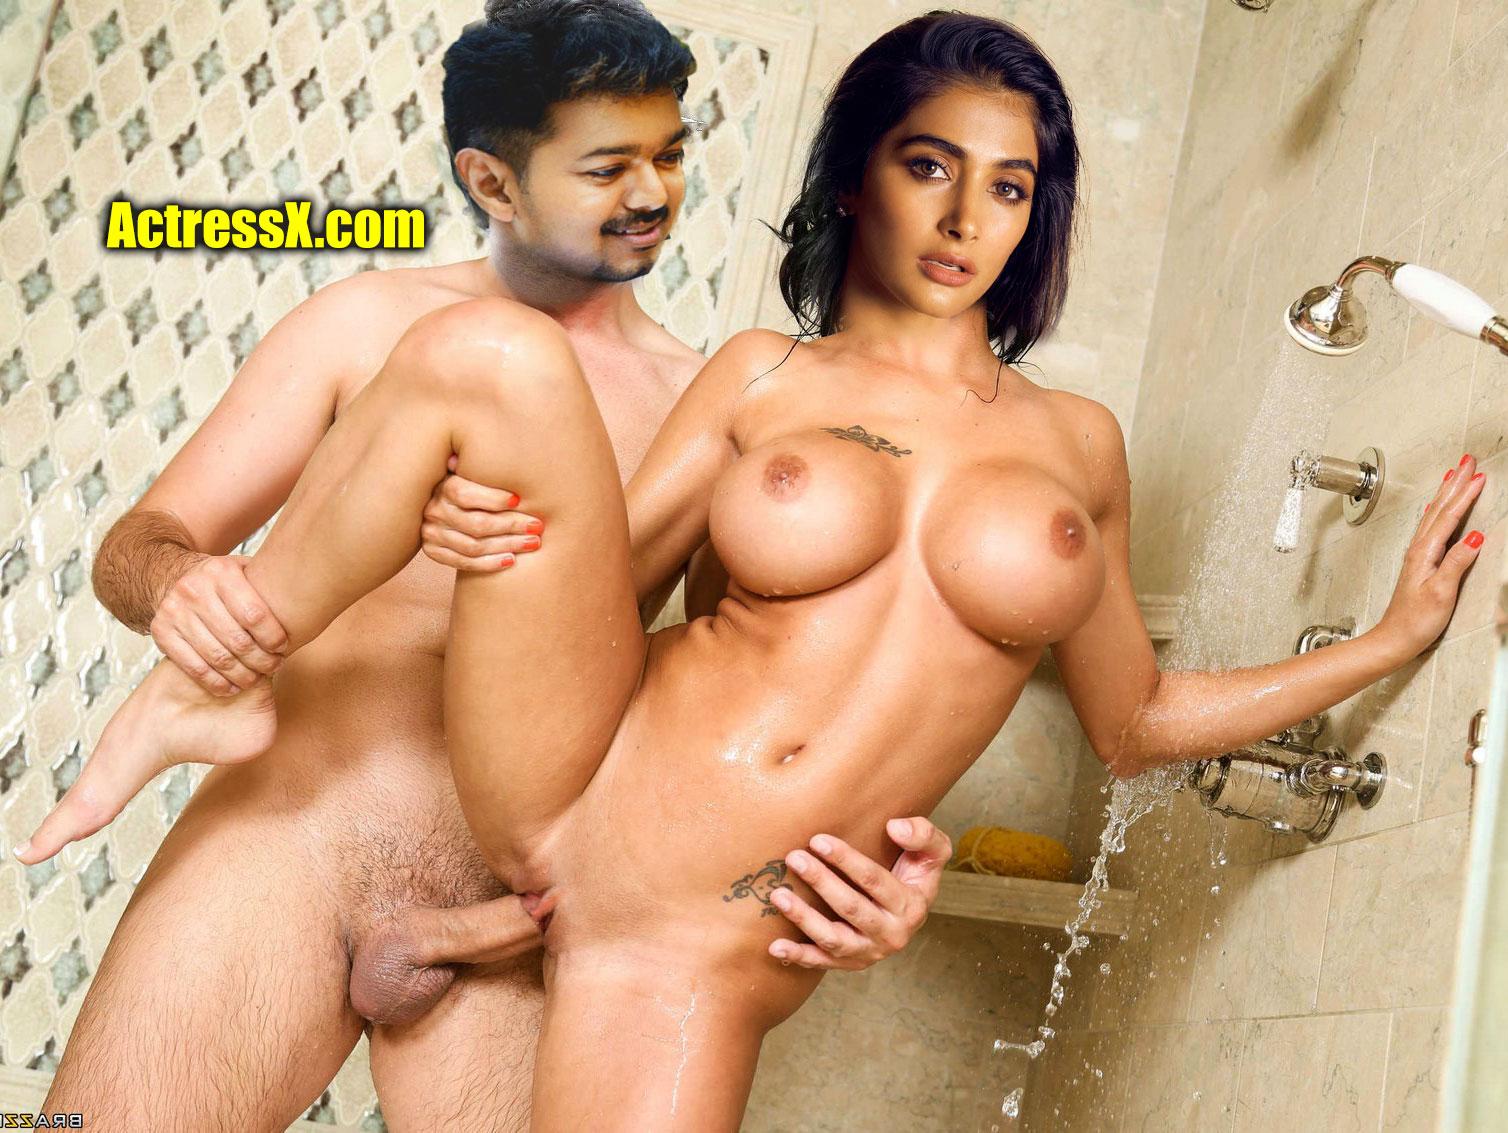 Vijay fucking nude sexy Pooja Hegde pussy bathroom fucking pic